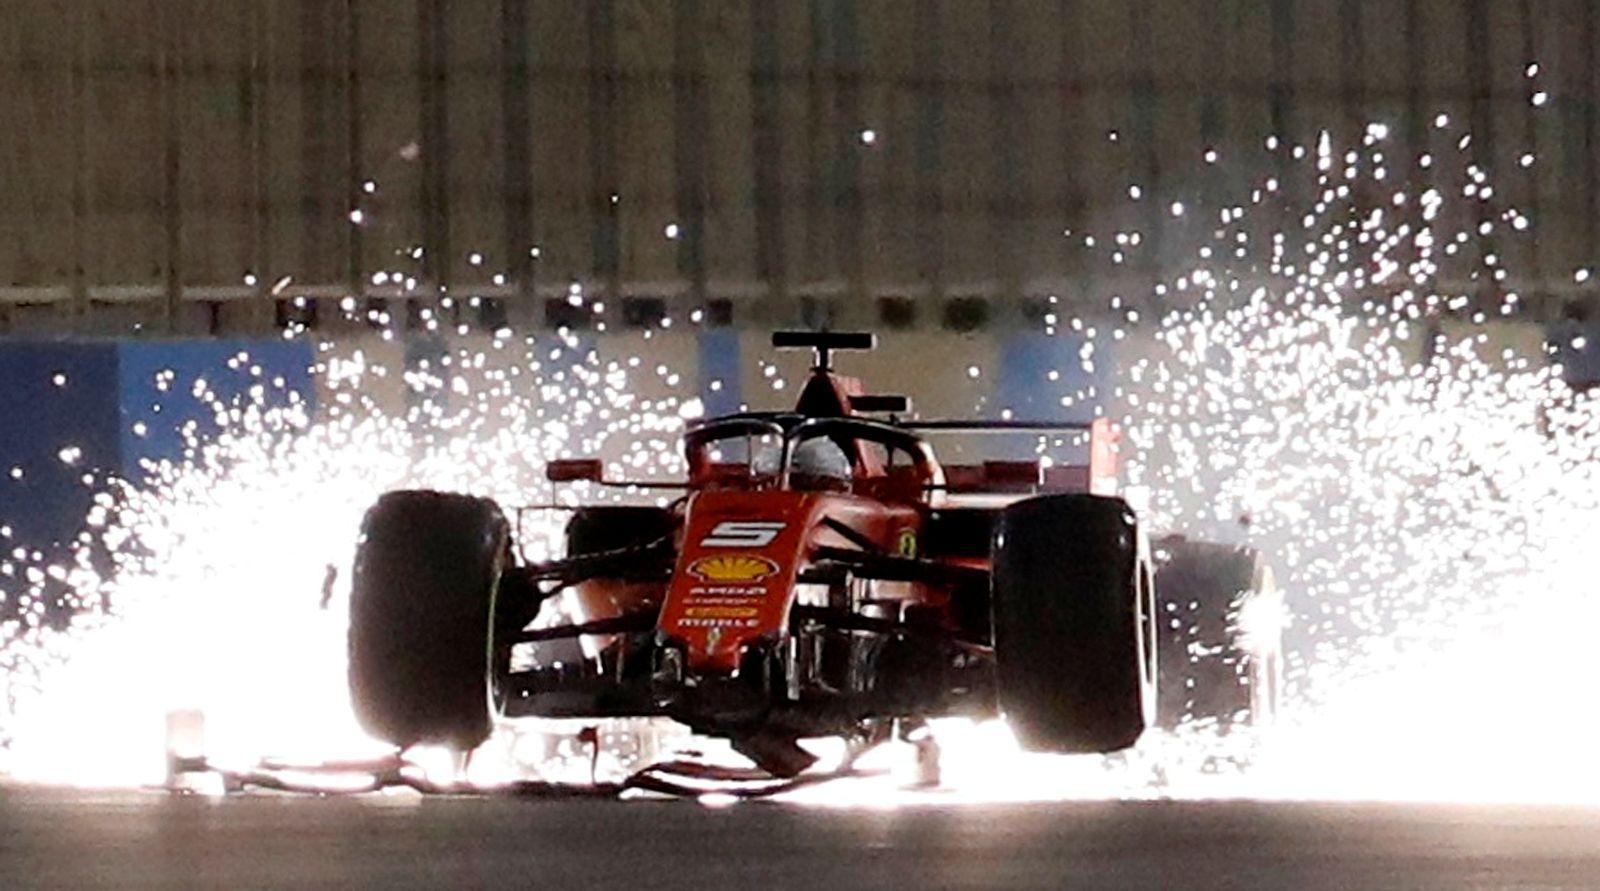 MOTOR-F1-BAHRAIN/